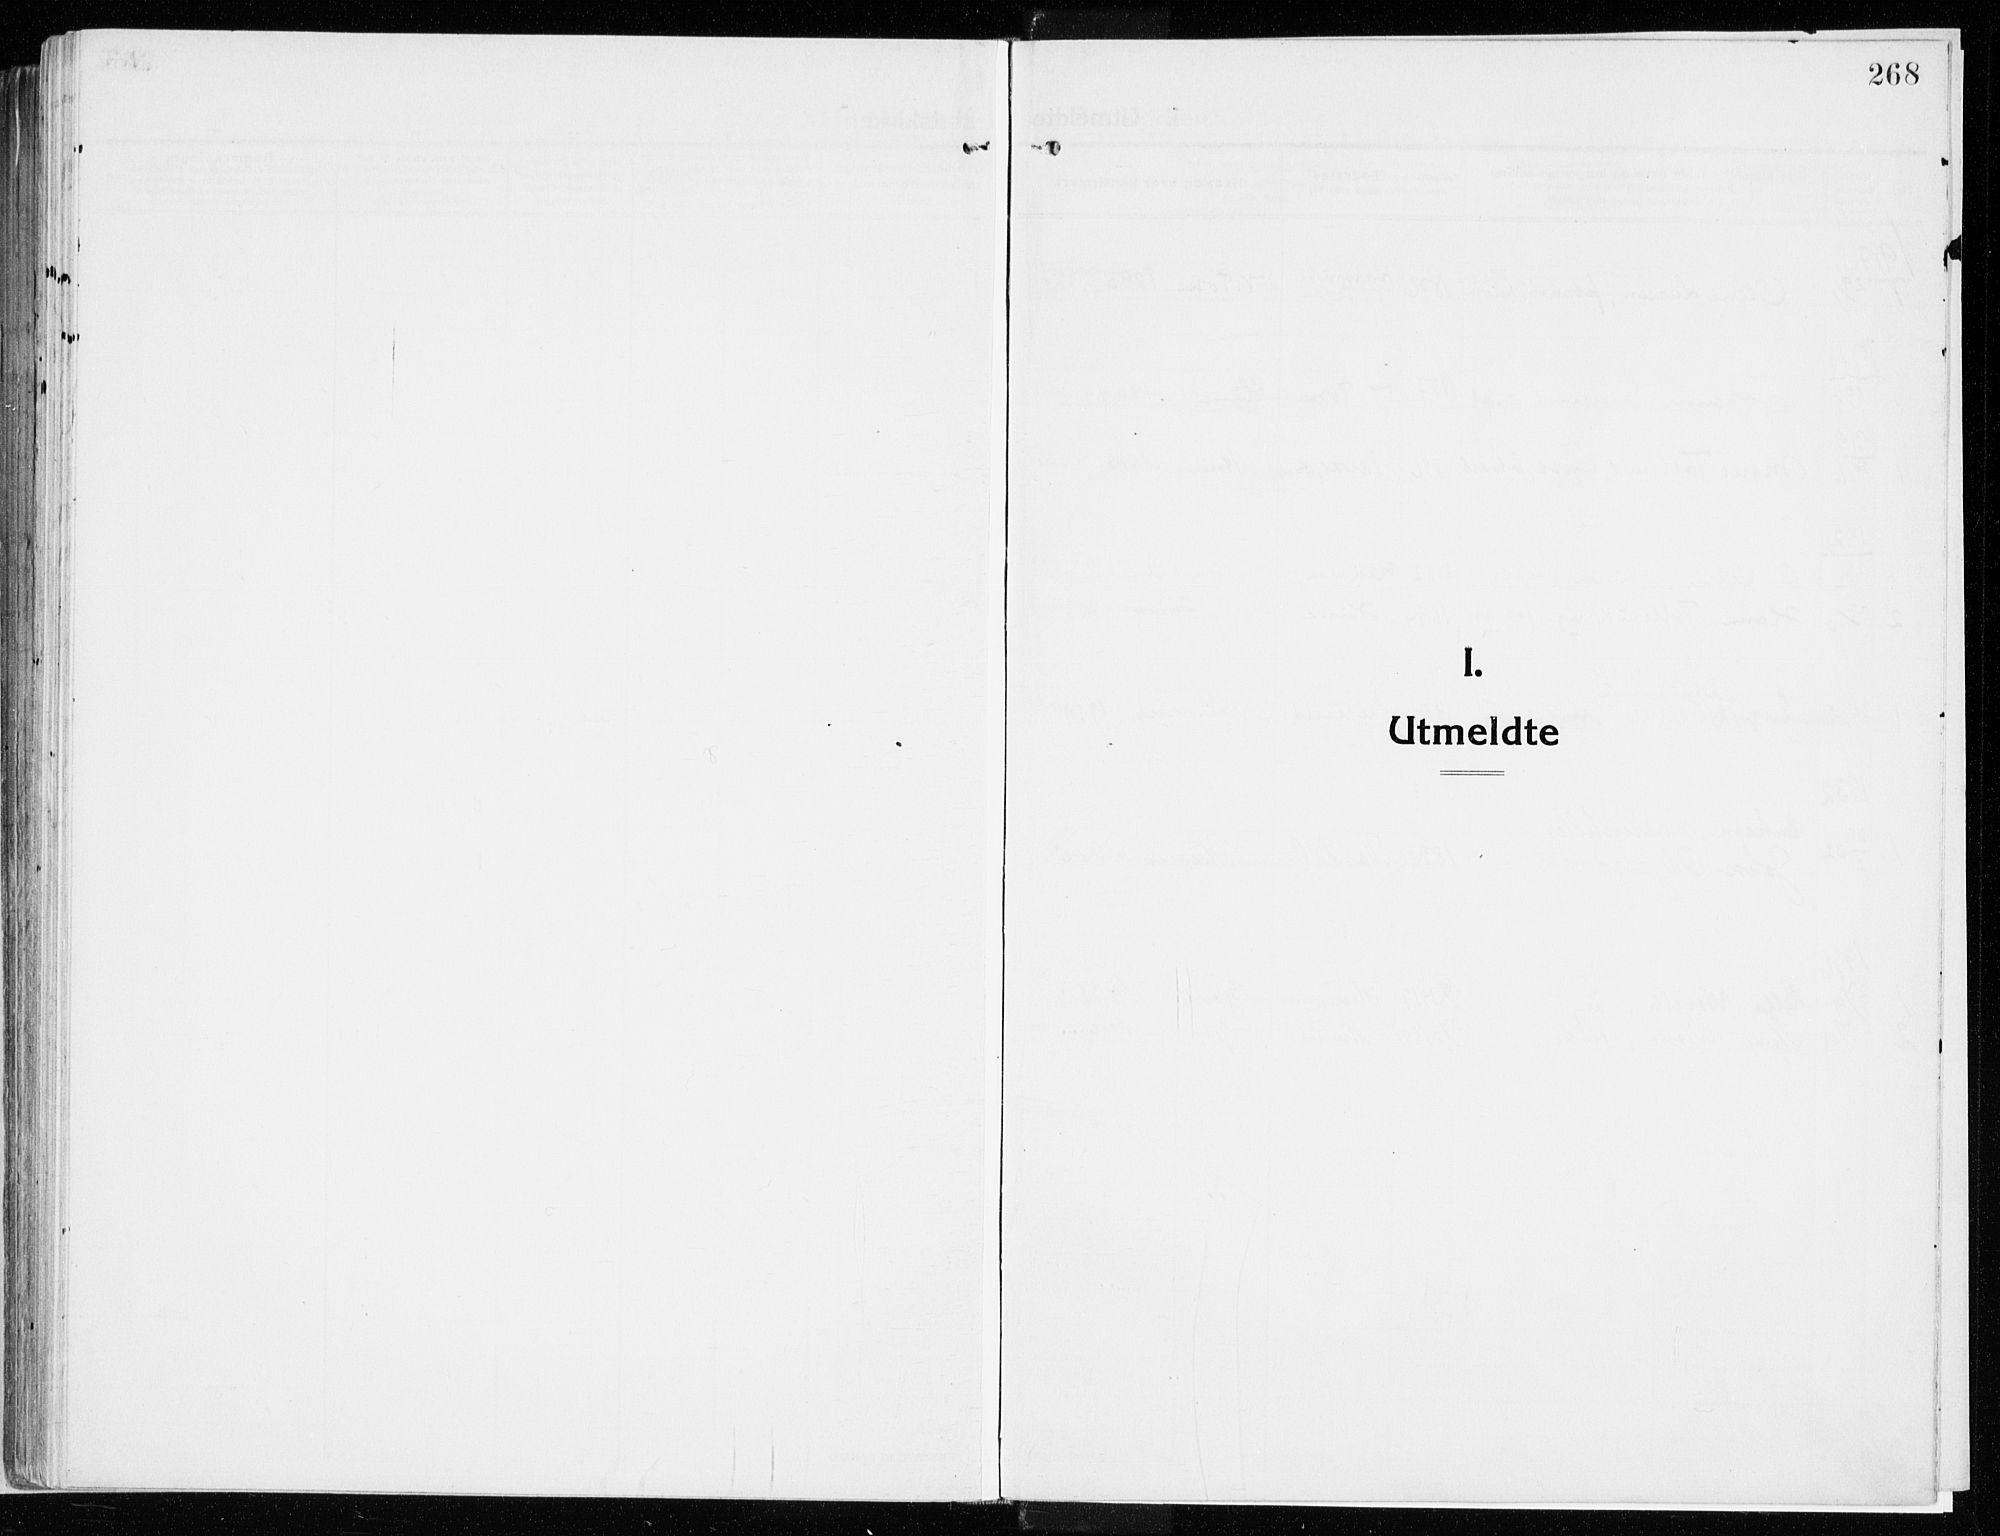 SAH, Vardal prestekontor, H/Ha/Haa/L0017: Ministerialbok nr. 17, 1915-1929, s. 268